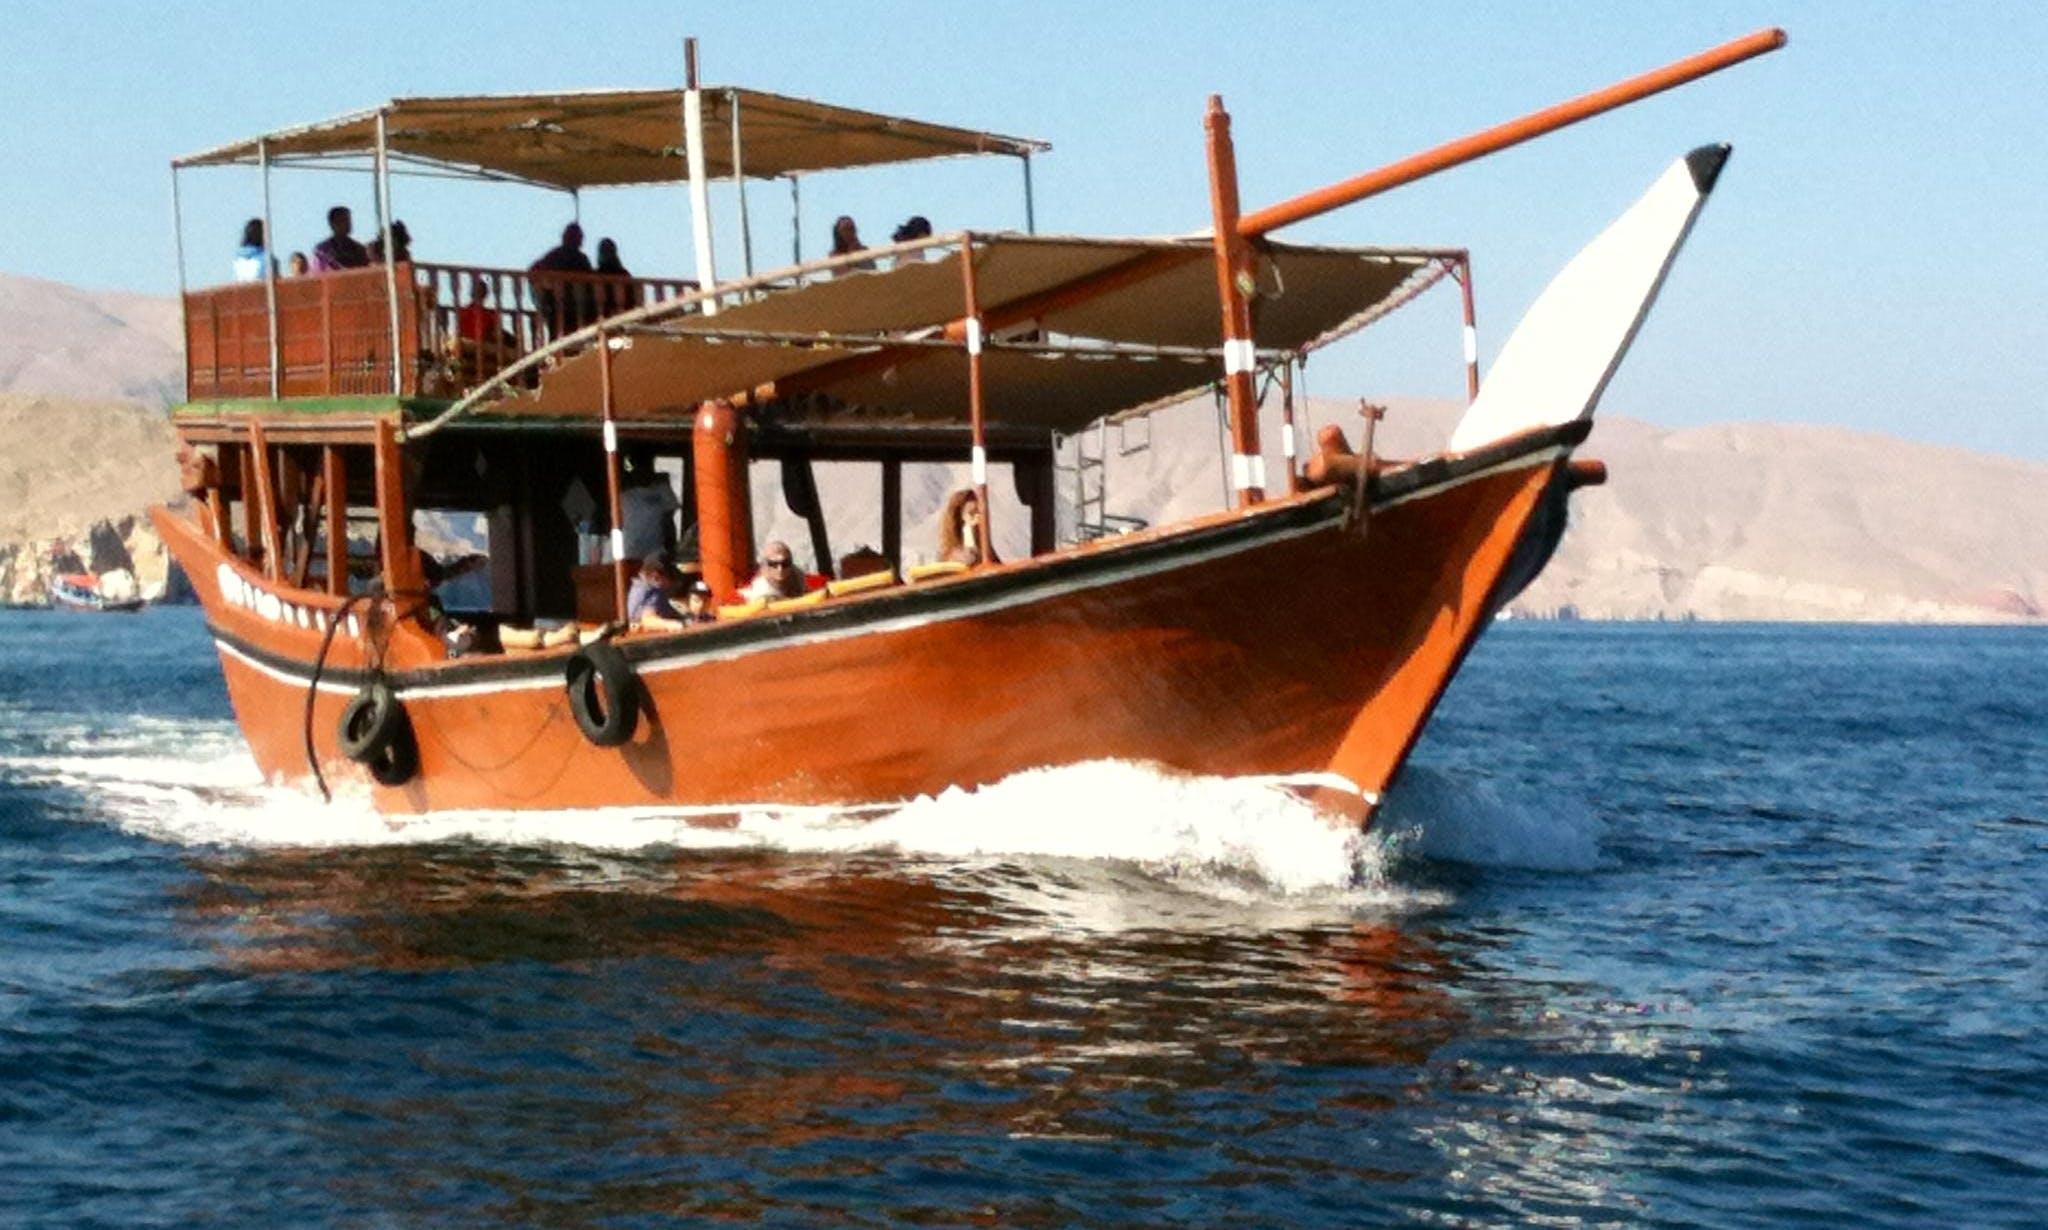 Cruise on a Wooden Boat in Al Khasab